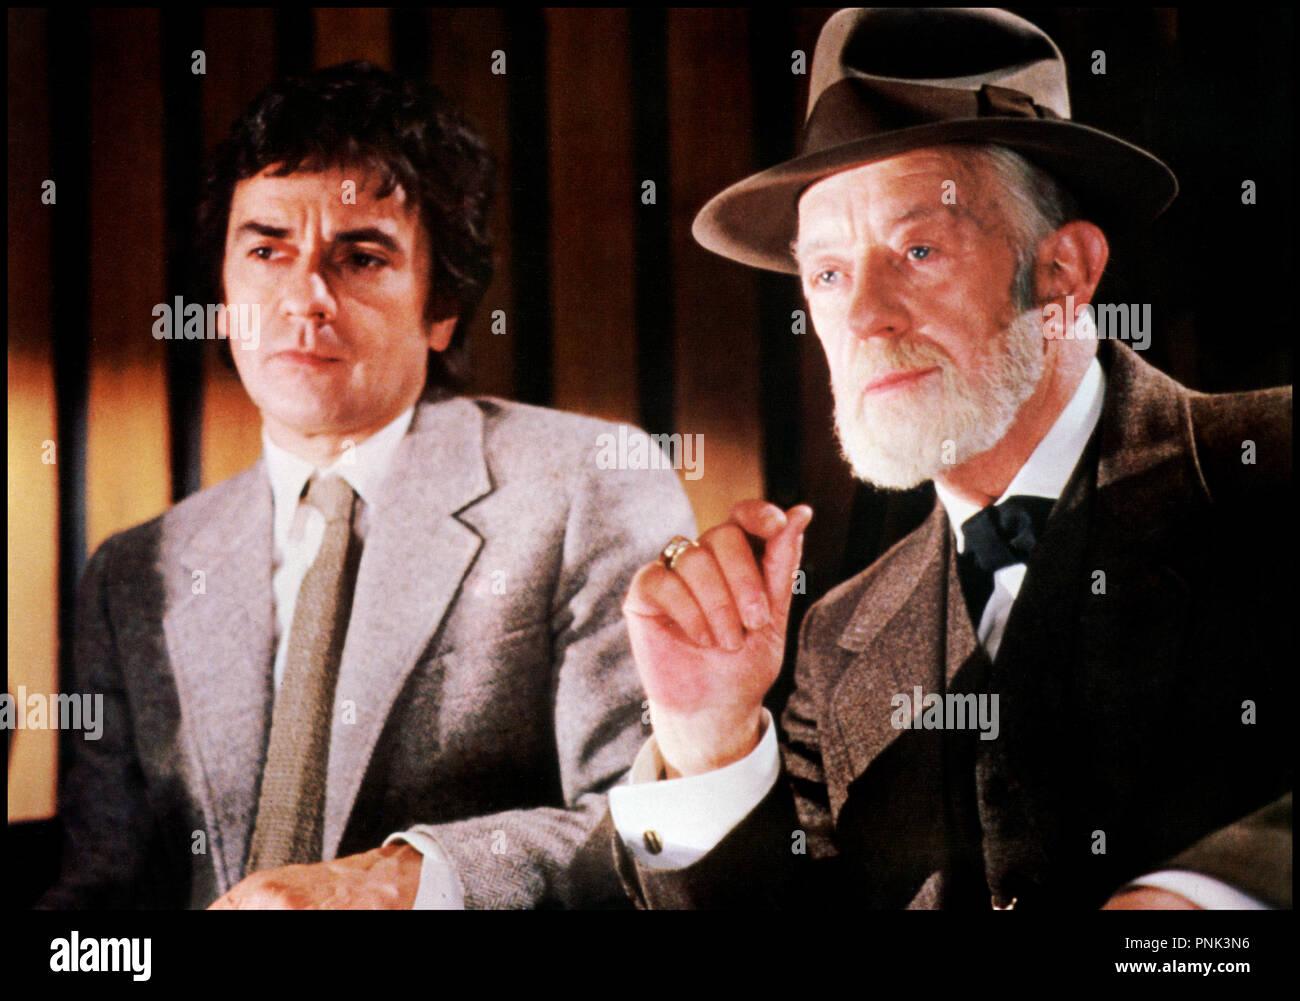 Prod DB © The Ladd Company / DR LOVESICK (LOVESICK) de Marshall Brickman 1983 USA avec Dudley Moore et Alec Guinness Sigmund Freud, grand pere, chapeau - Stock Image